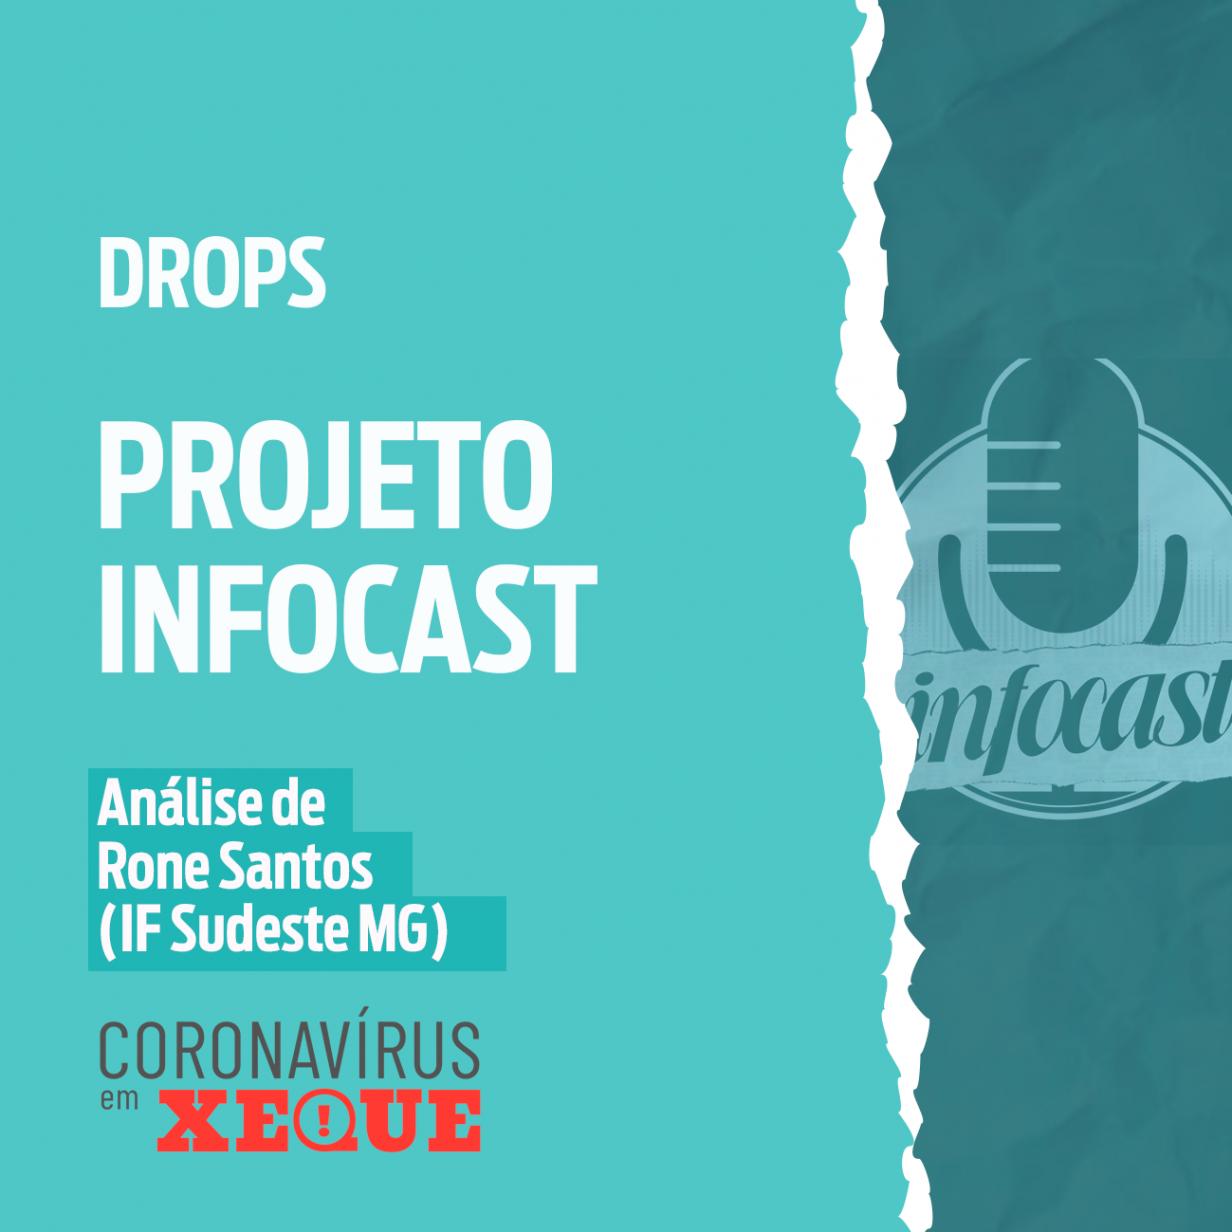 Projeto Infocast